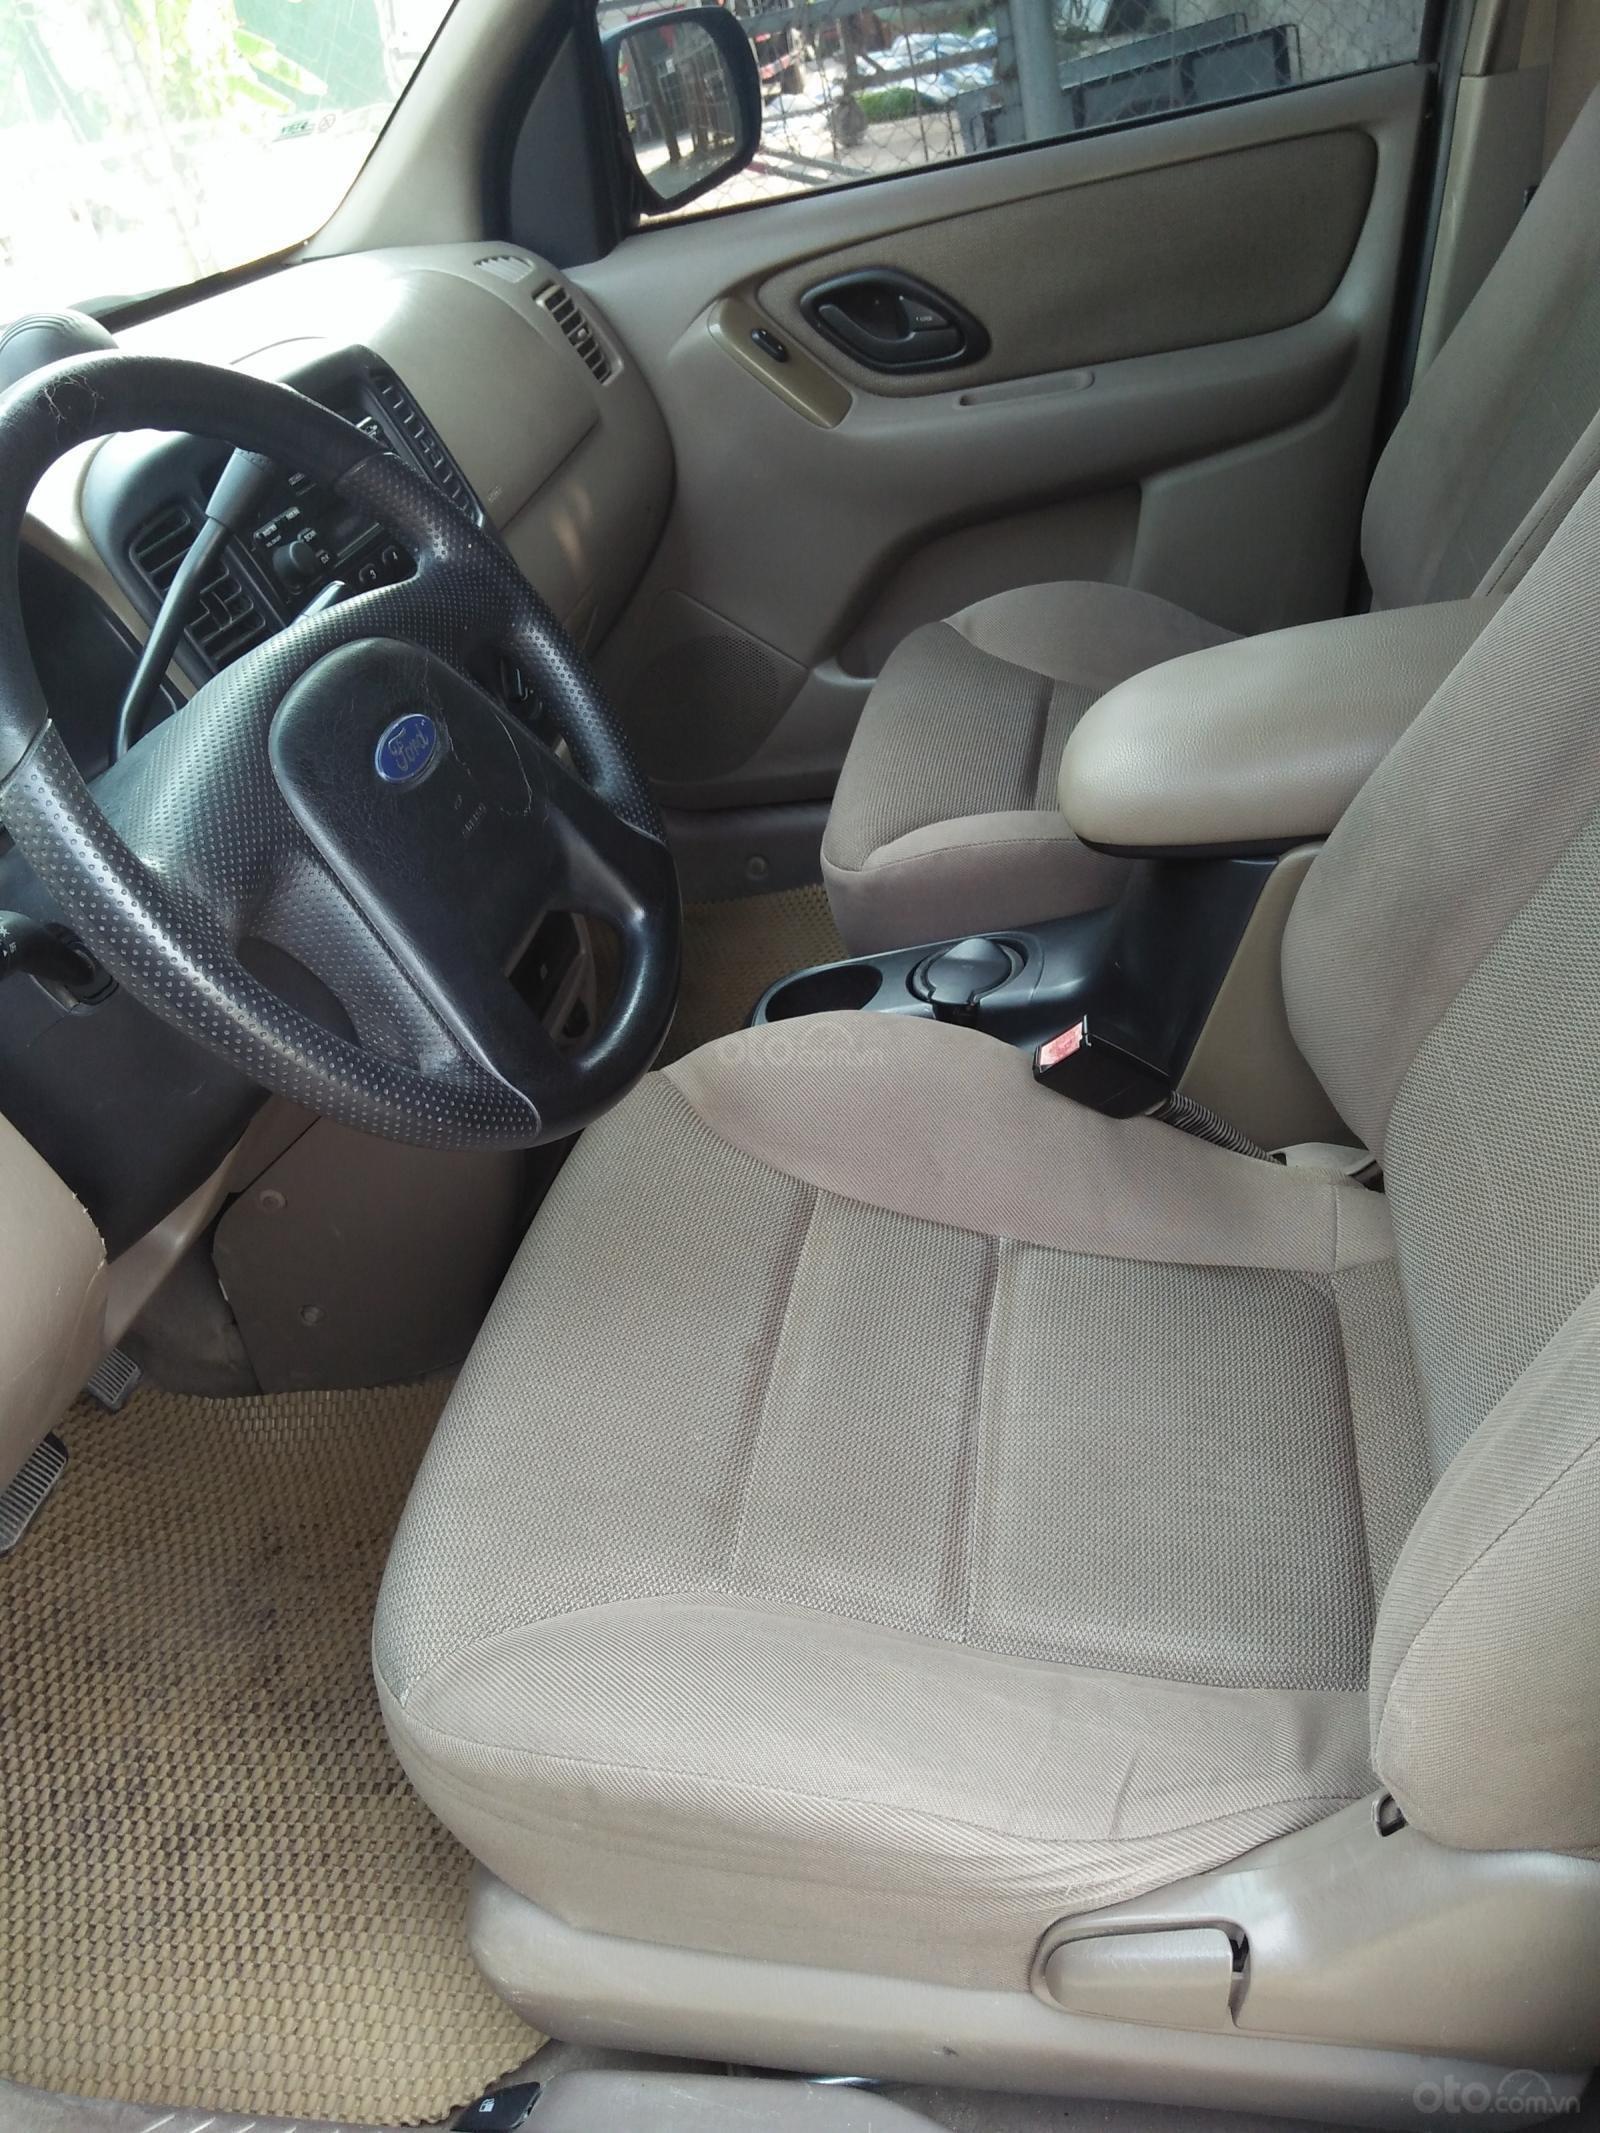 Cần bán Ford Escape 2003, giá 155 triệu (3)